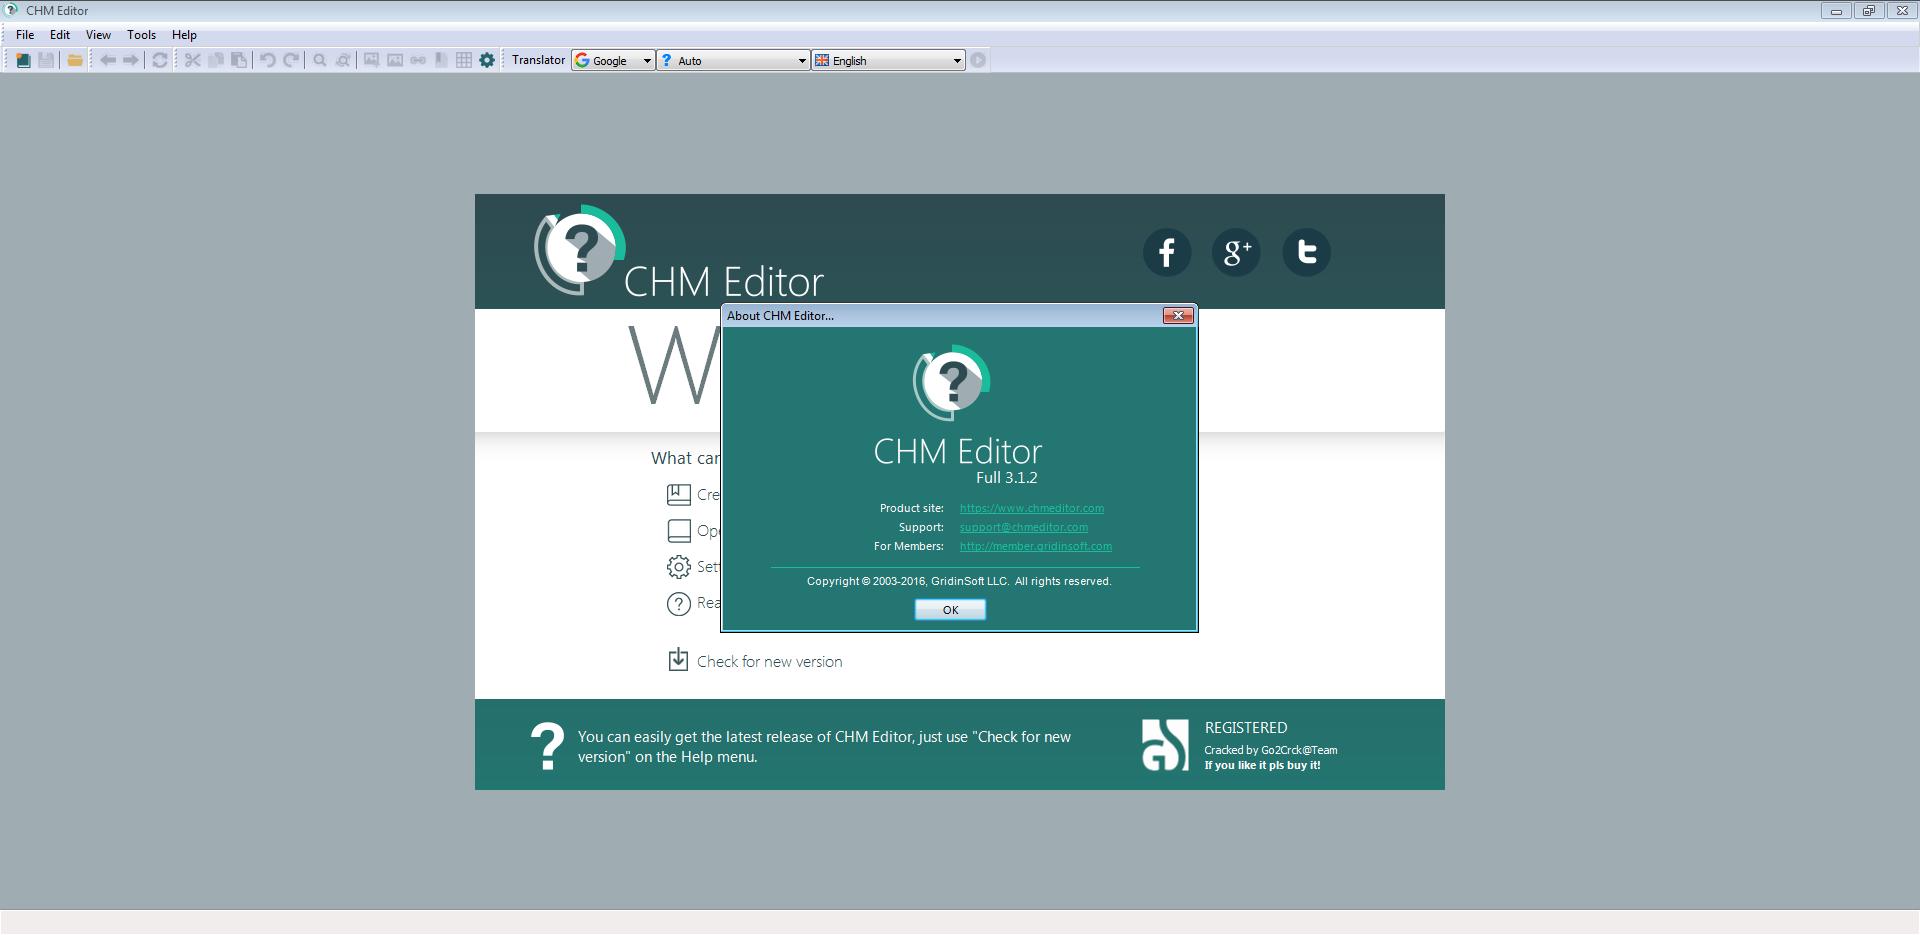 chm editor free download full version